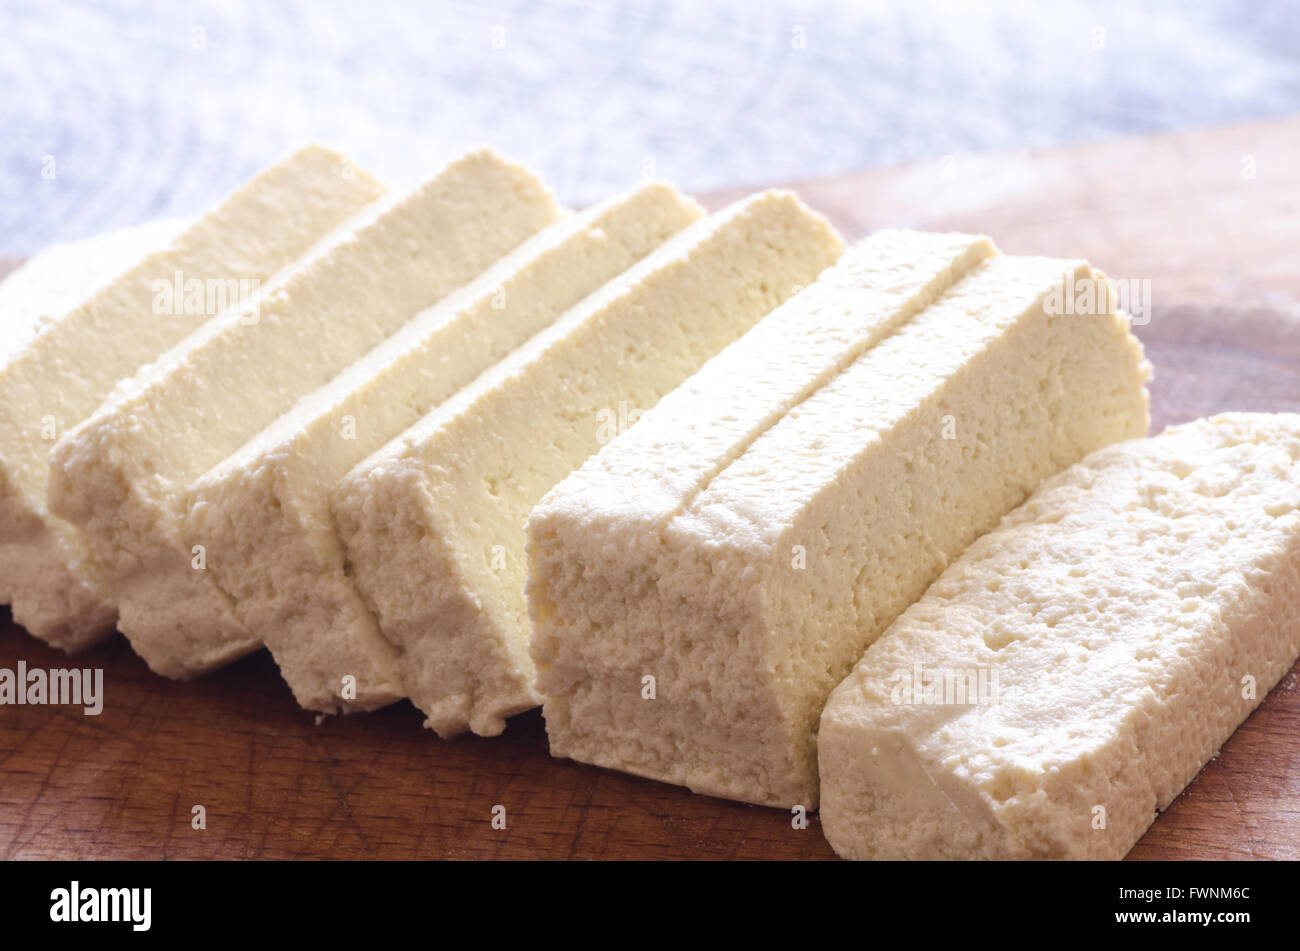 raw soya tofu on table - Stock Image